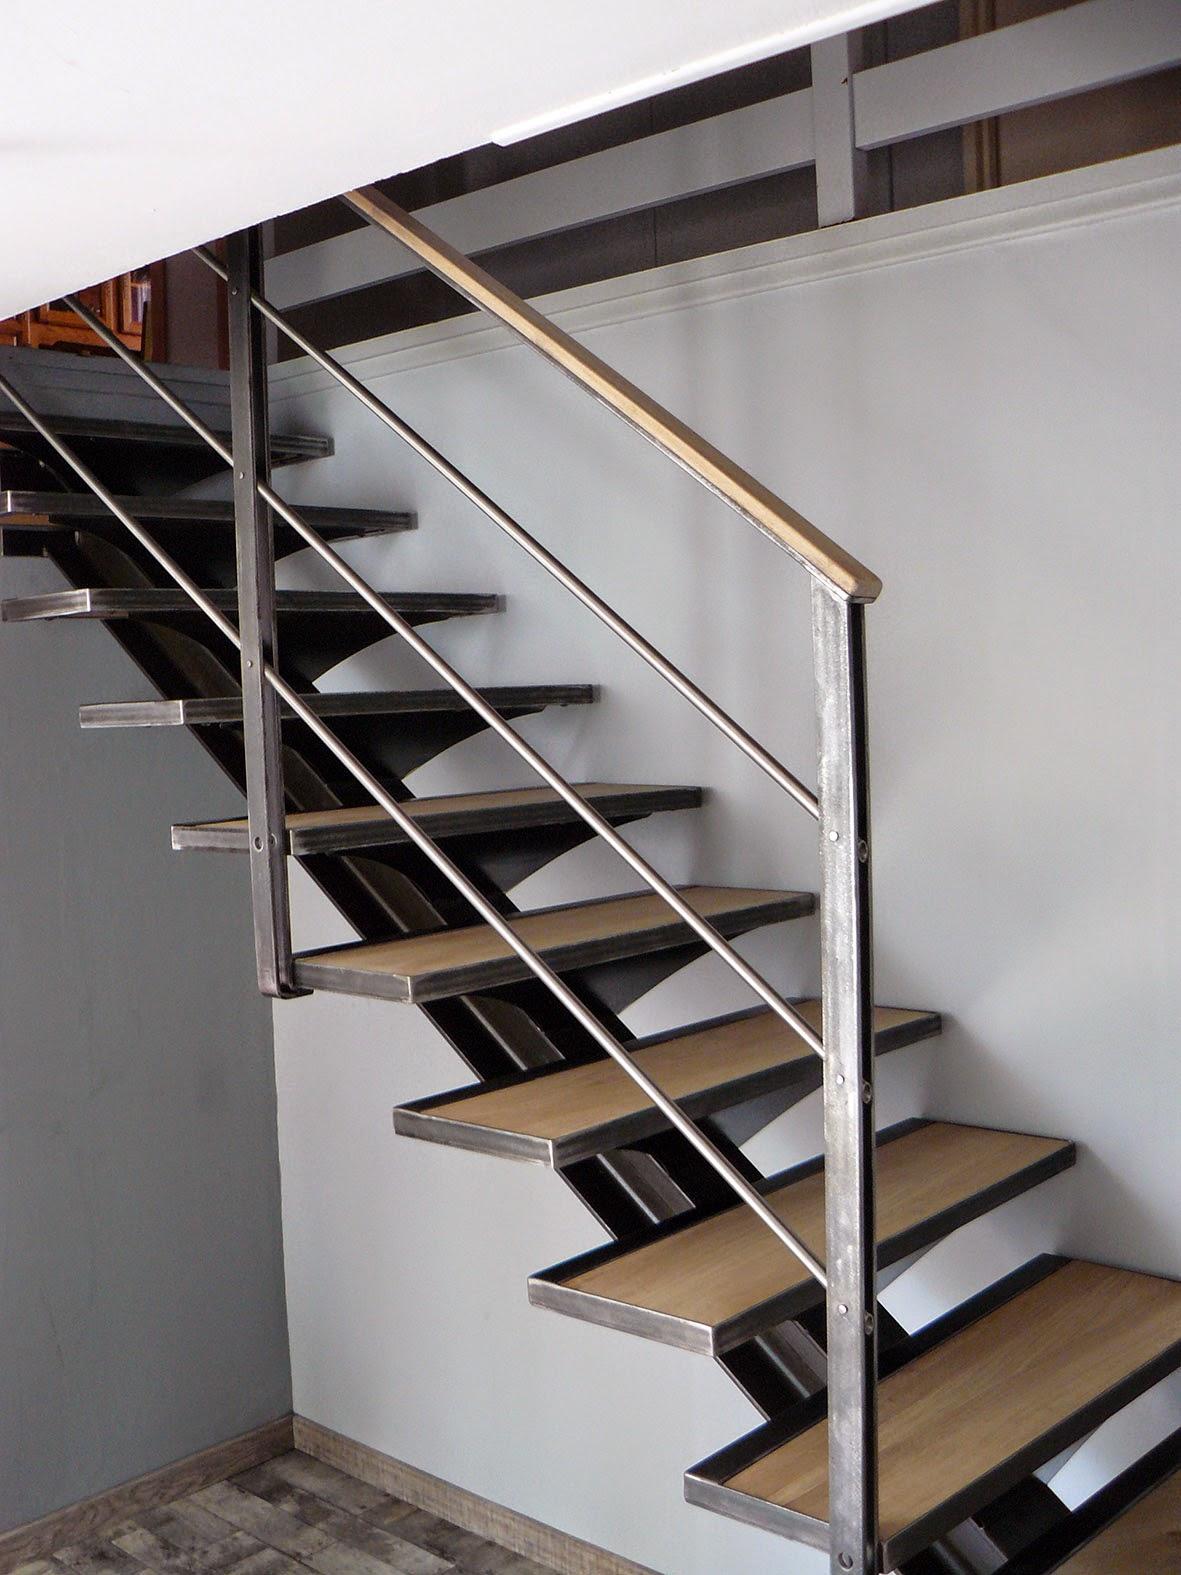 Ferronnerie m tallerie serrurerie 79 deux s vres l 39 art du for Escalier tournant